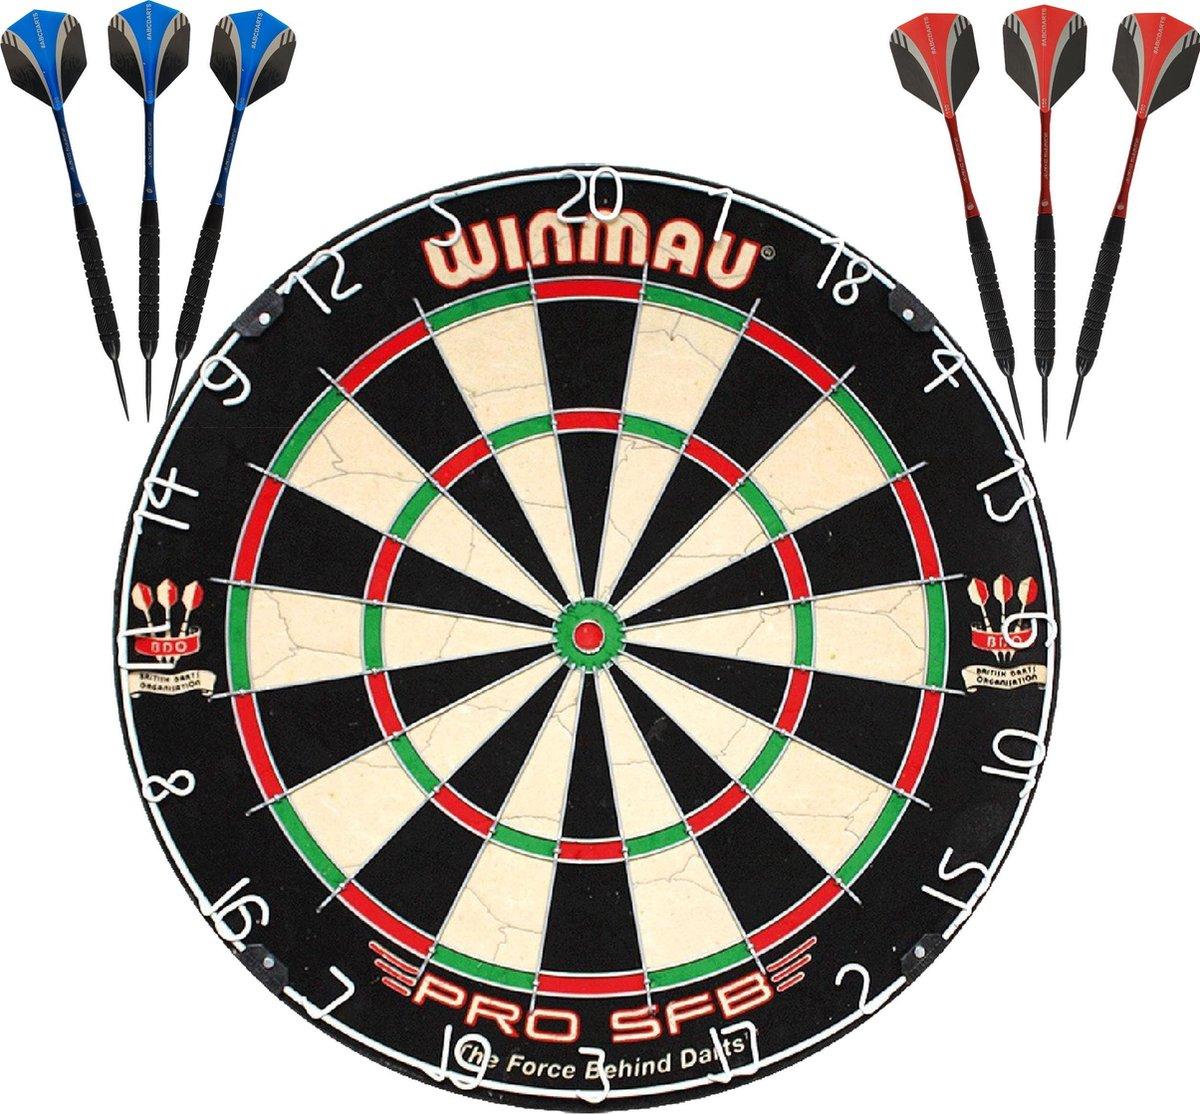 Winmau Pro SFB Dartbord + 2 Sets ABCDarts Sniper Black Darts Dartpijlen